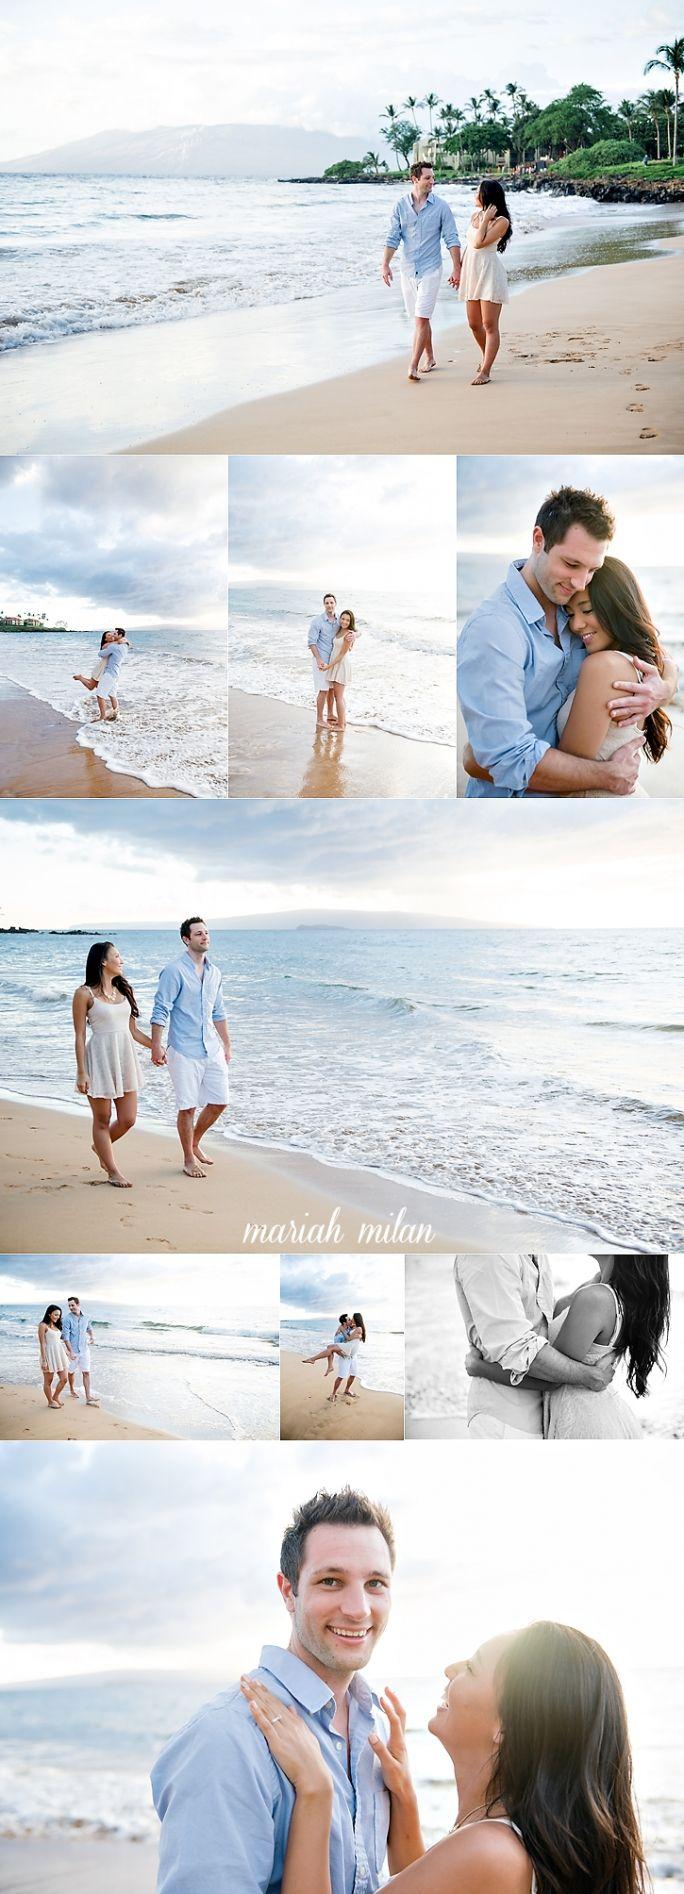 maui+photographers+mariah+milan-2